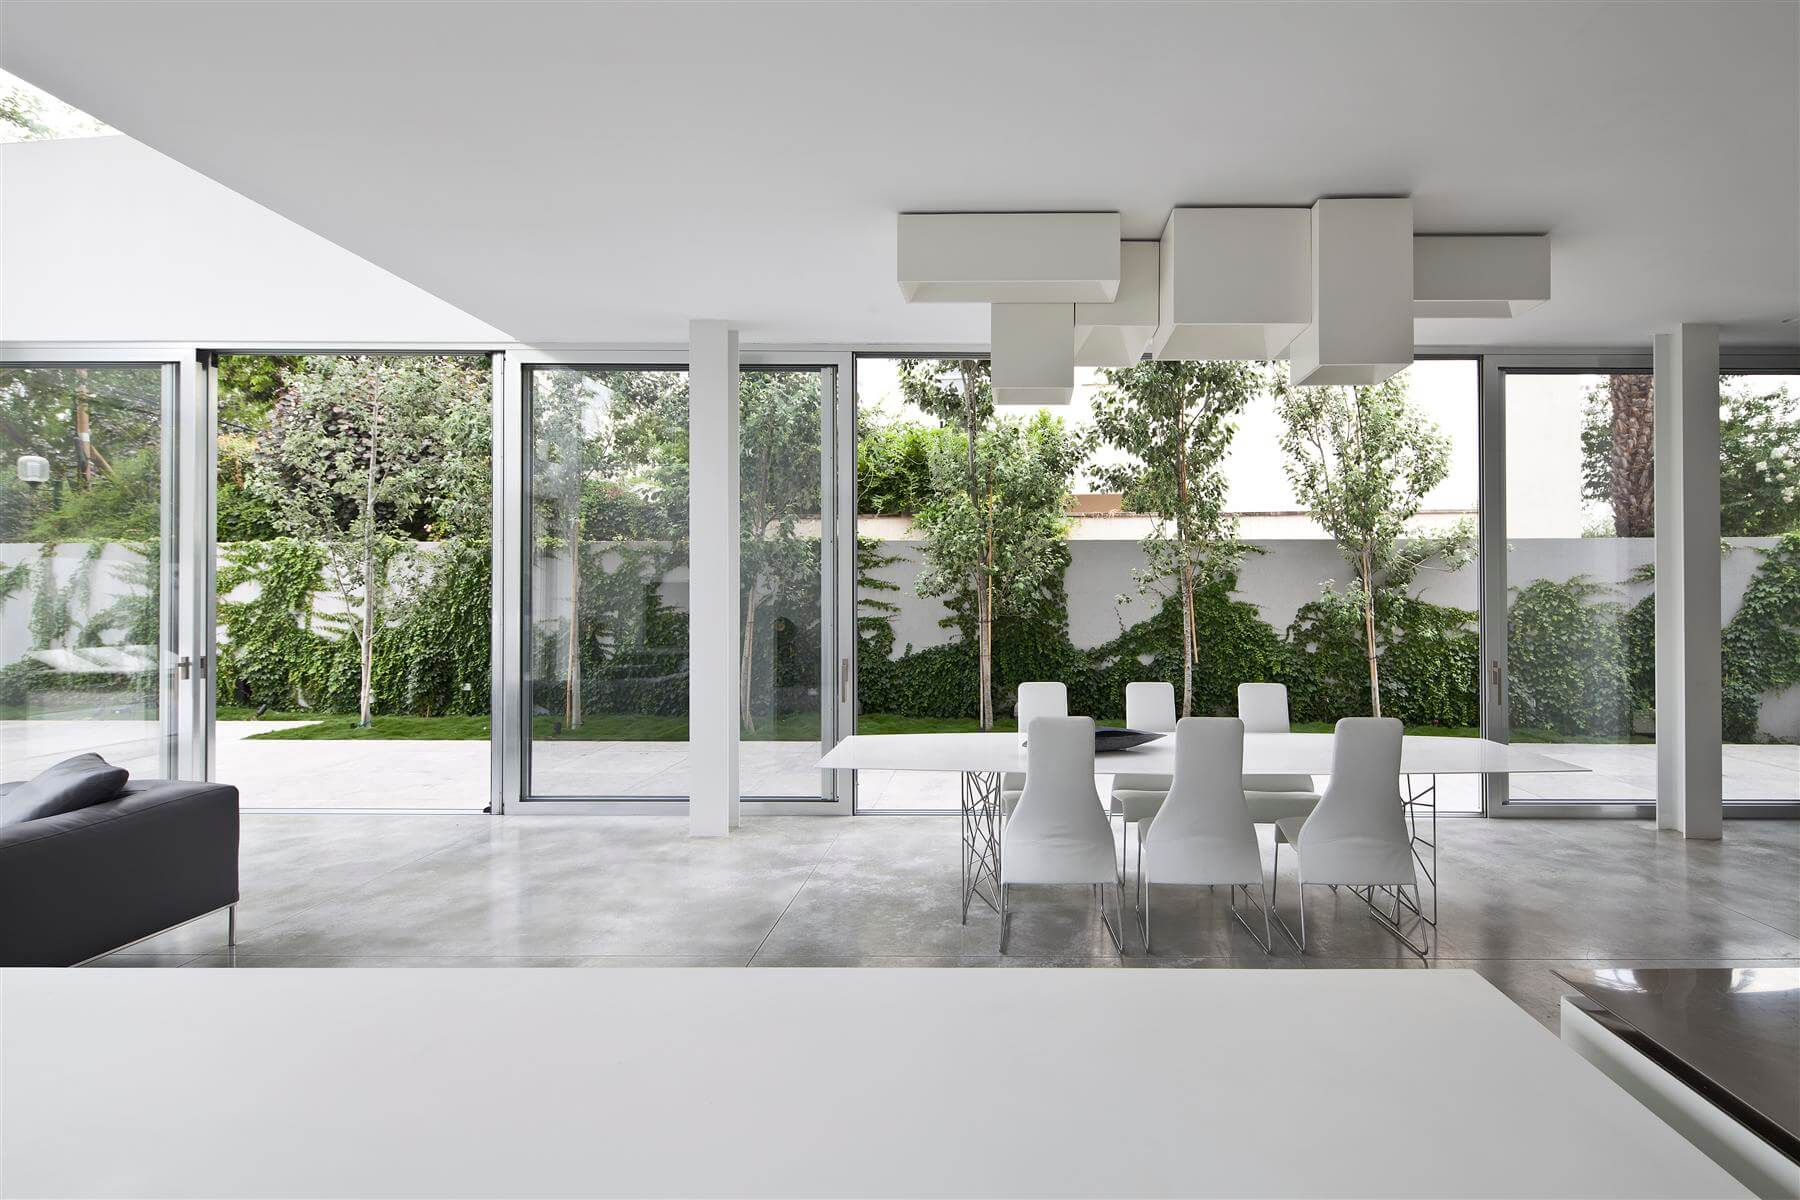 The Concrete Cut House in Ramat Gan by Pitsou Kedem Architects-02